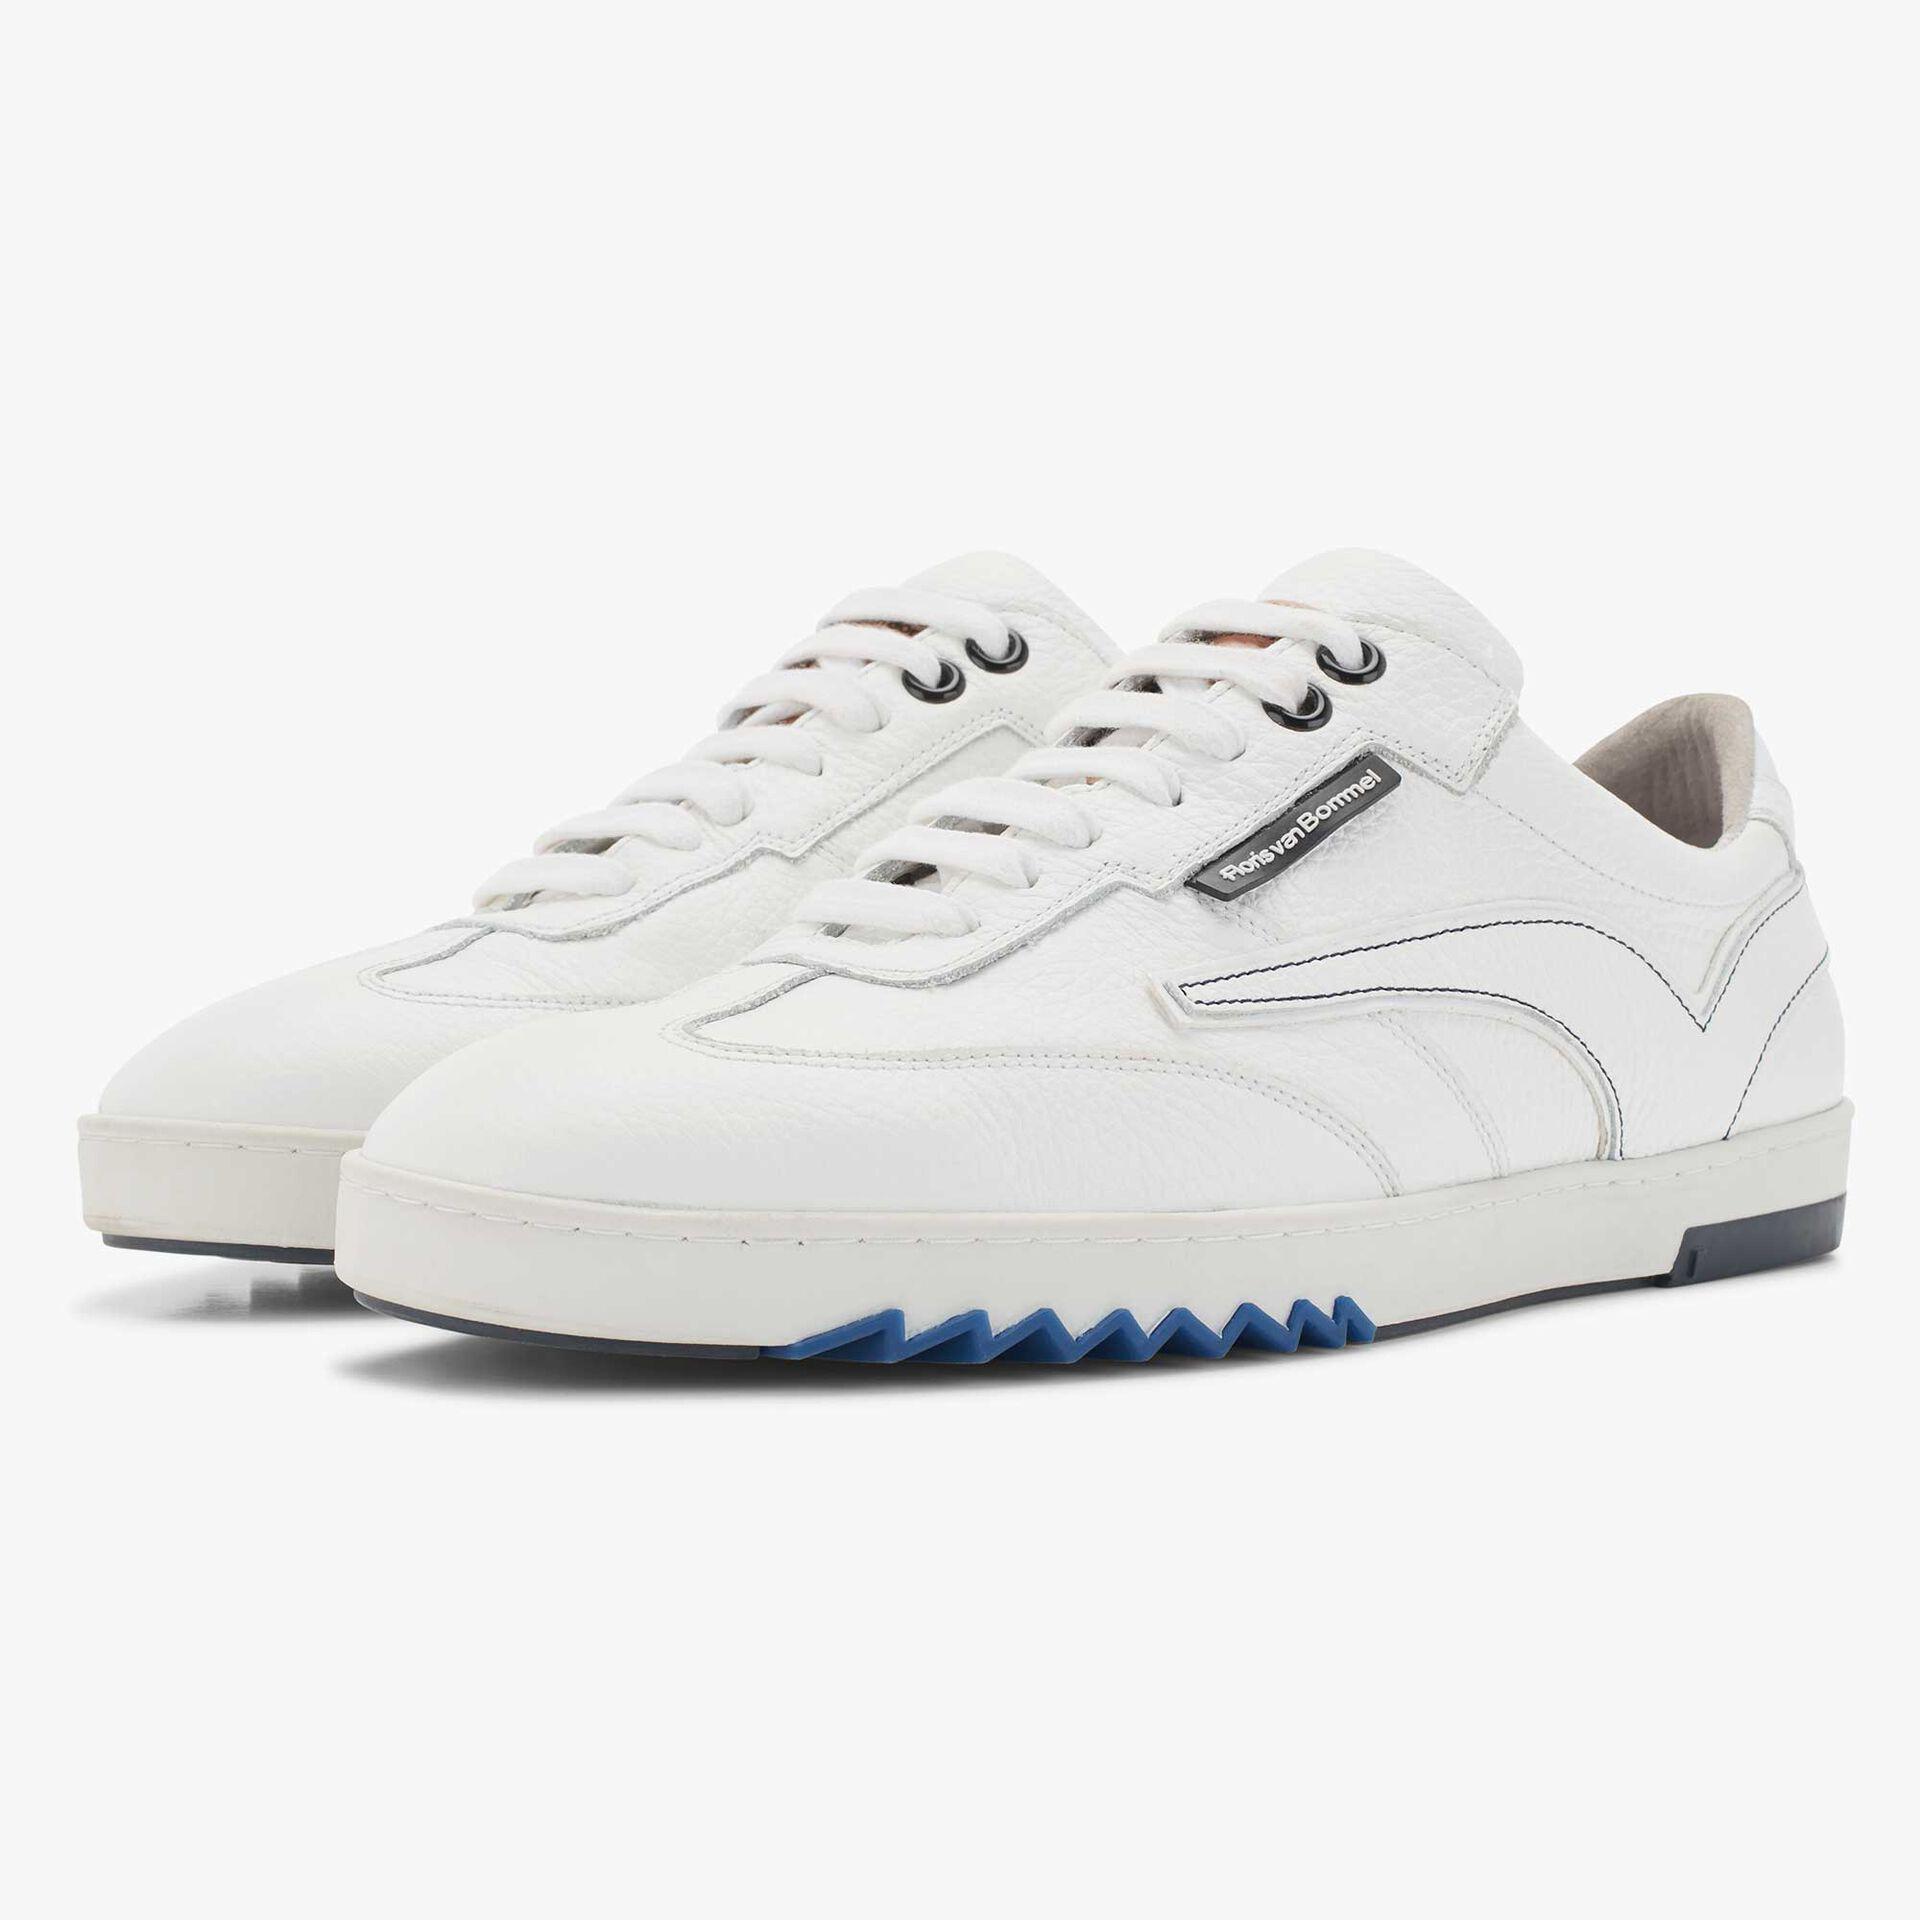 Weißer Leder Sneaker